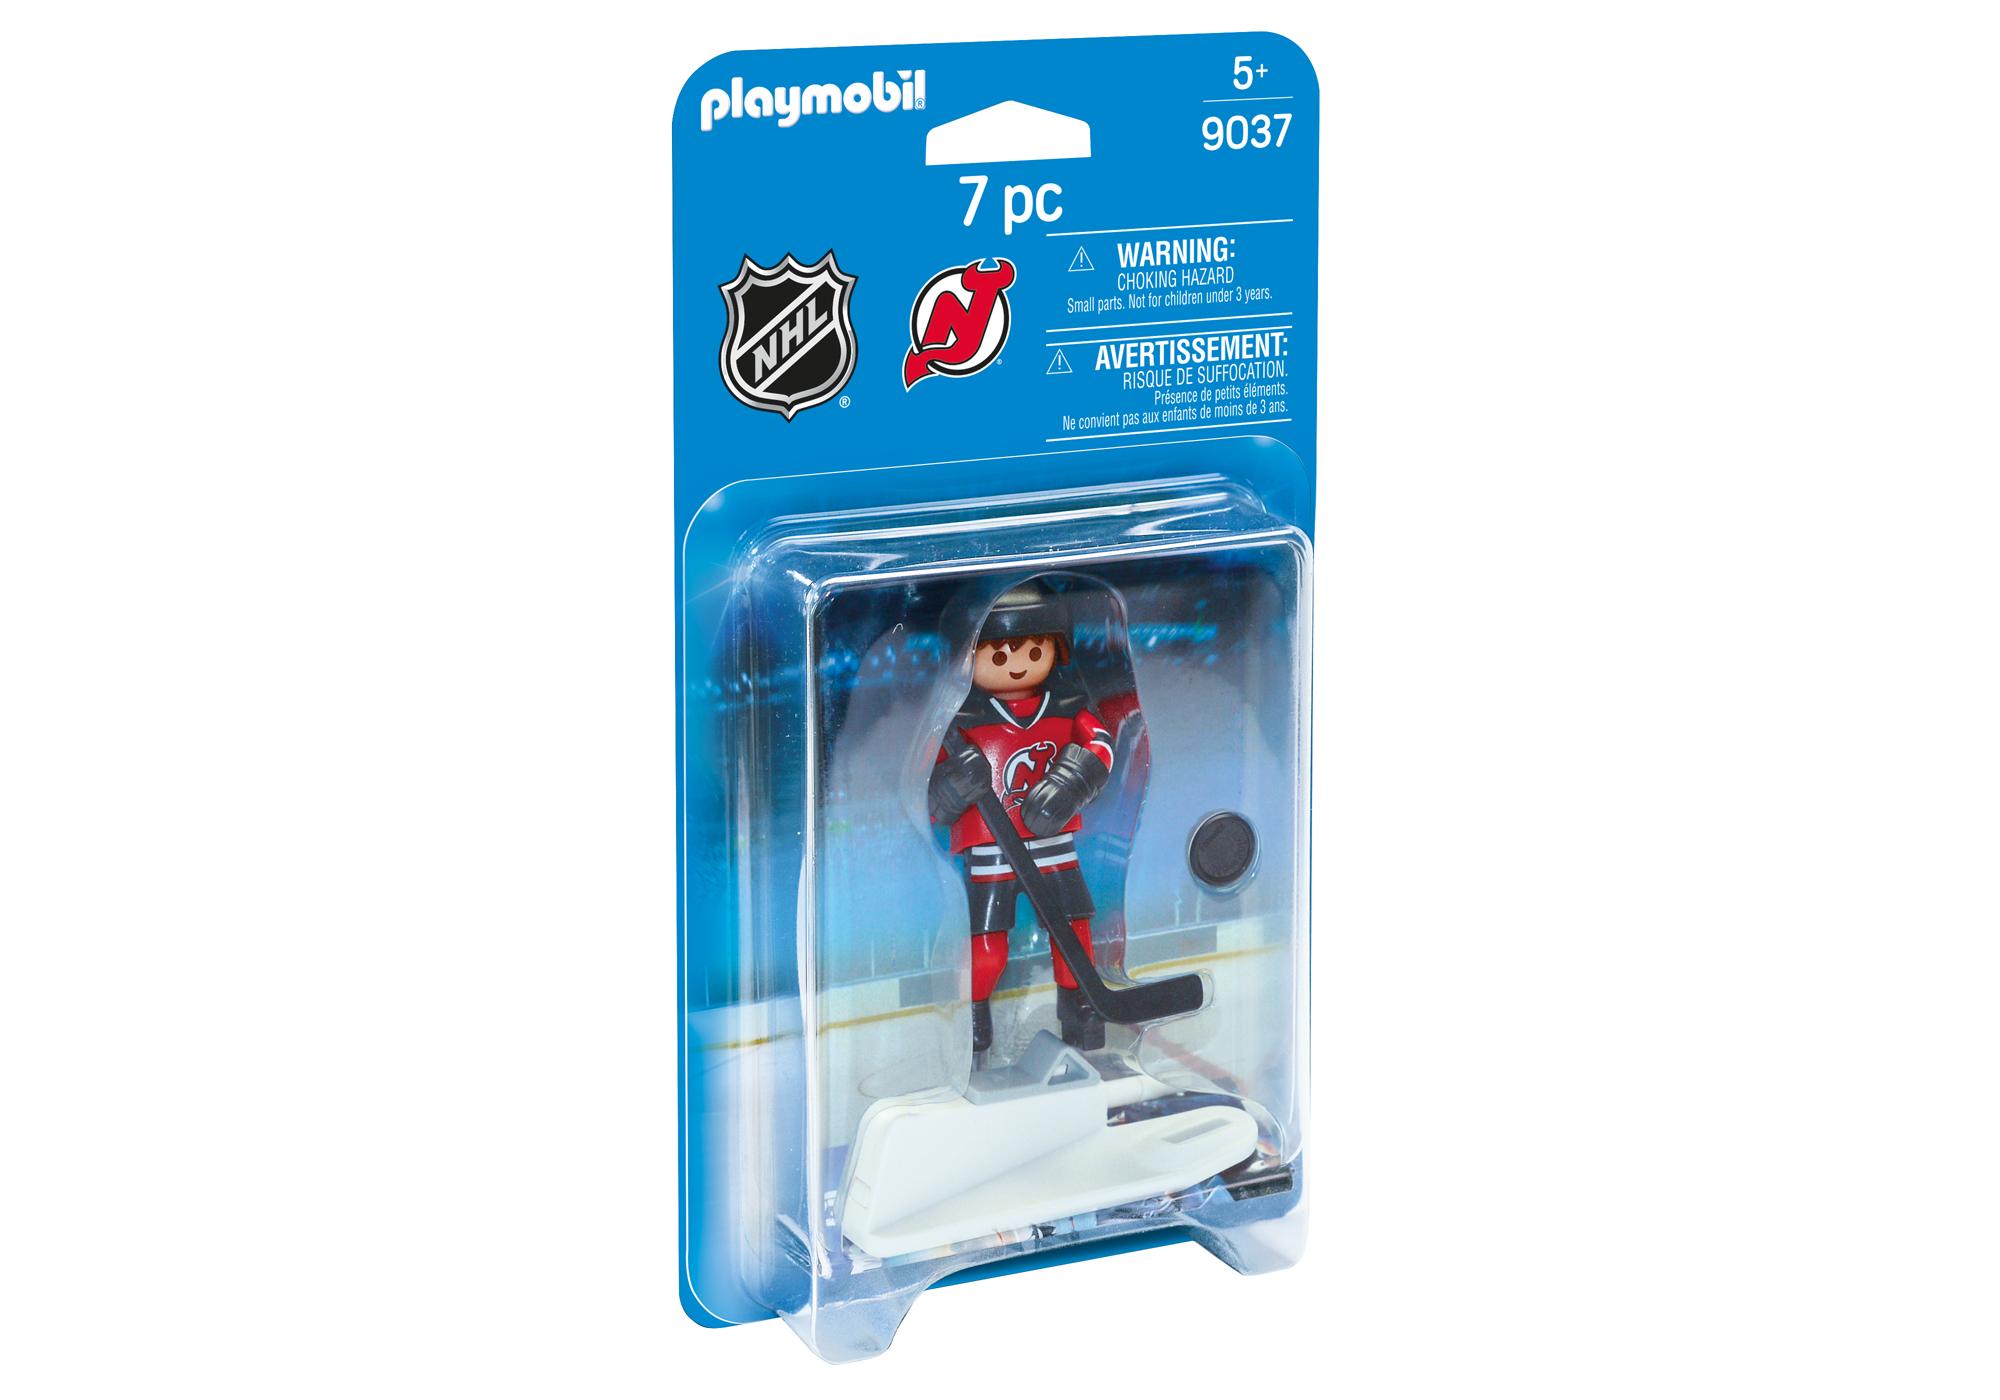 http://media.playmobil.com/i/playmobil/9037_product_box_front/NHL™ New Jersey Devils™ Player